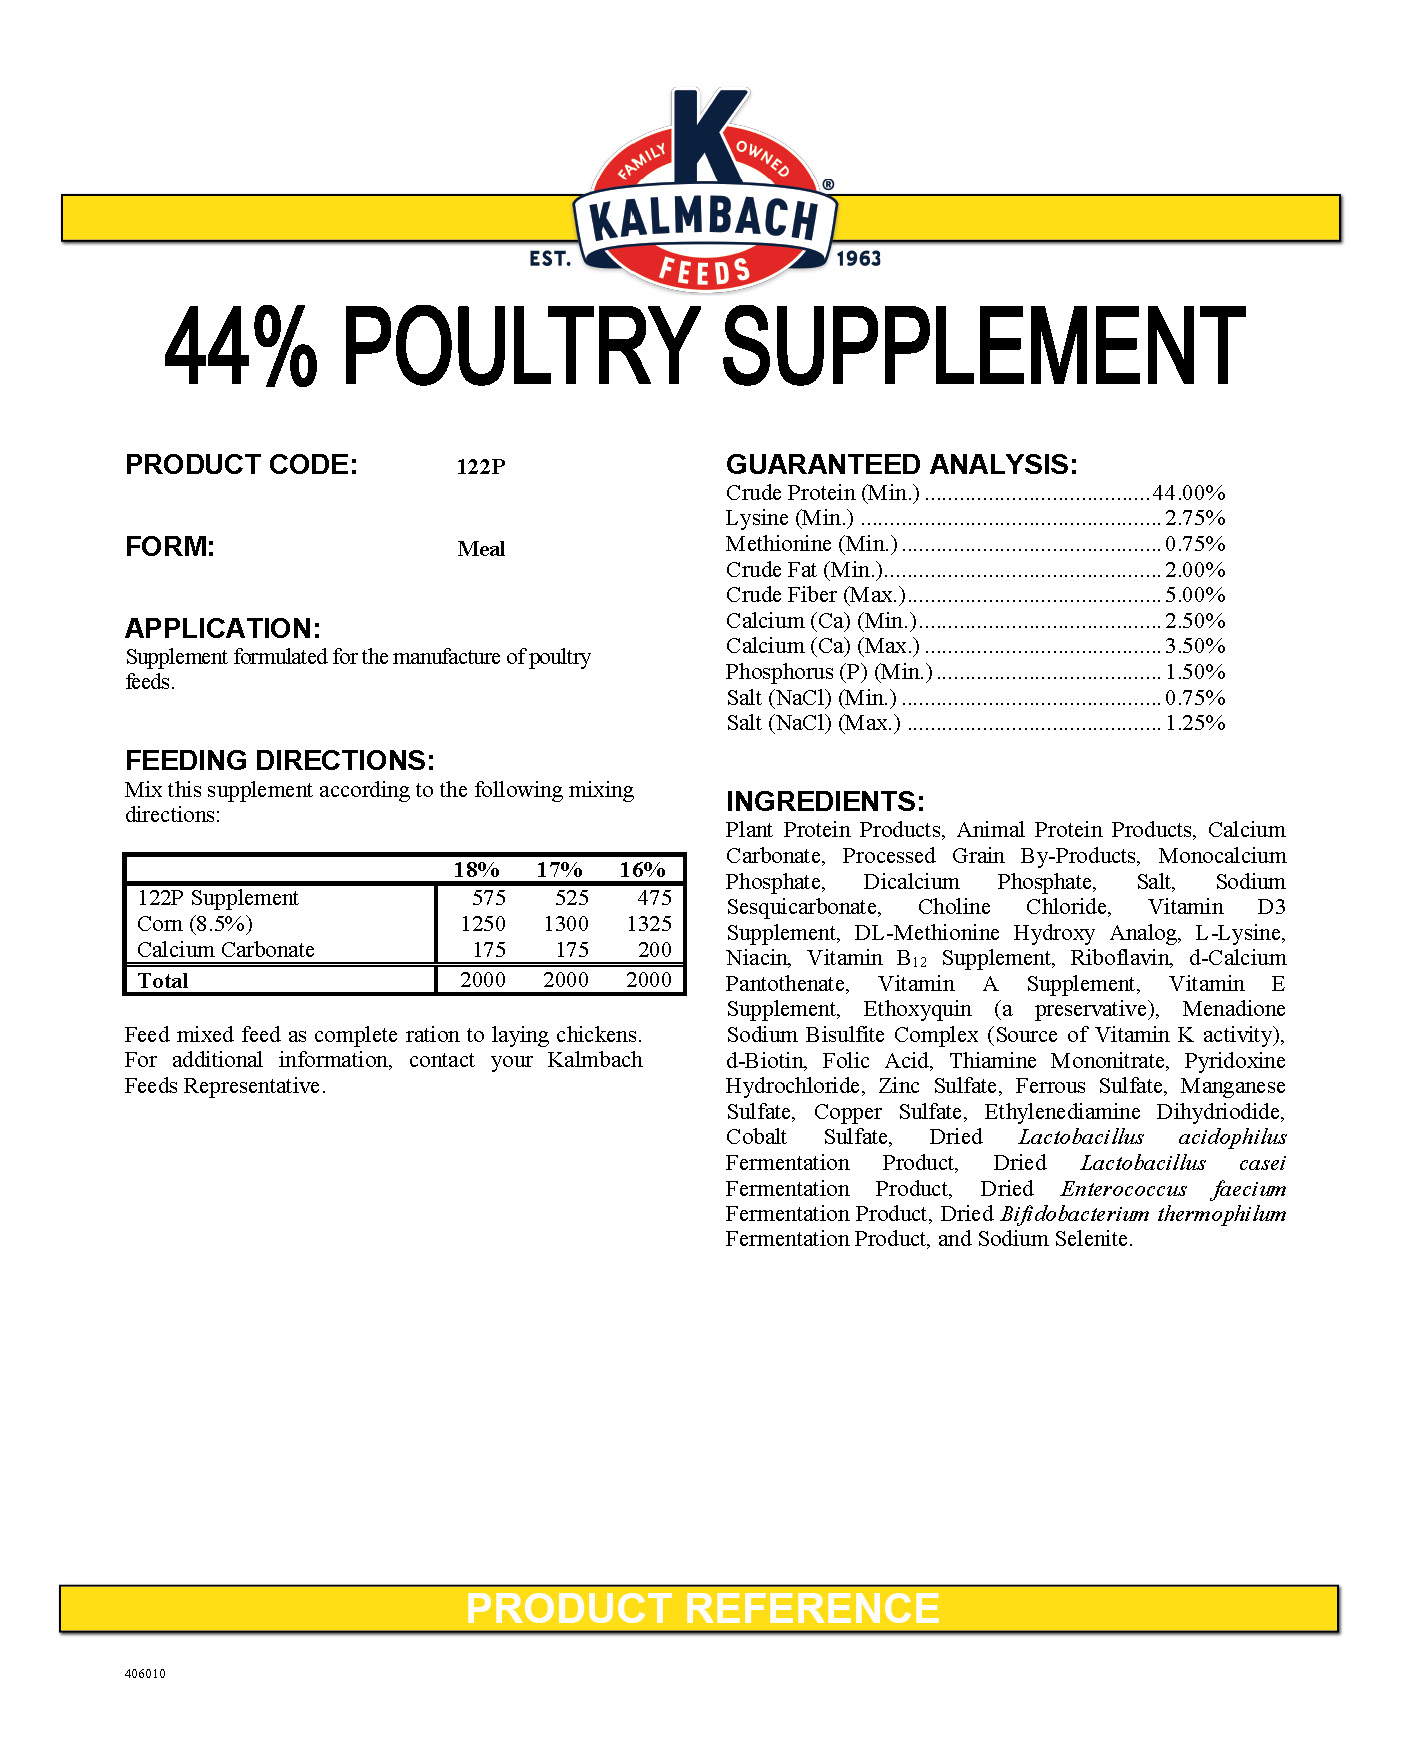 44% Poultry Supplement spec sheet